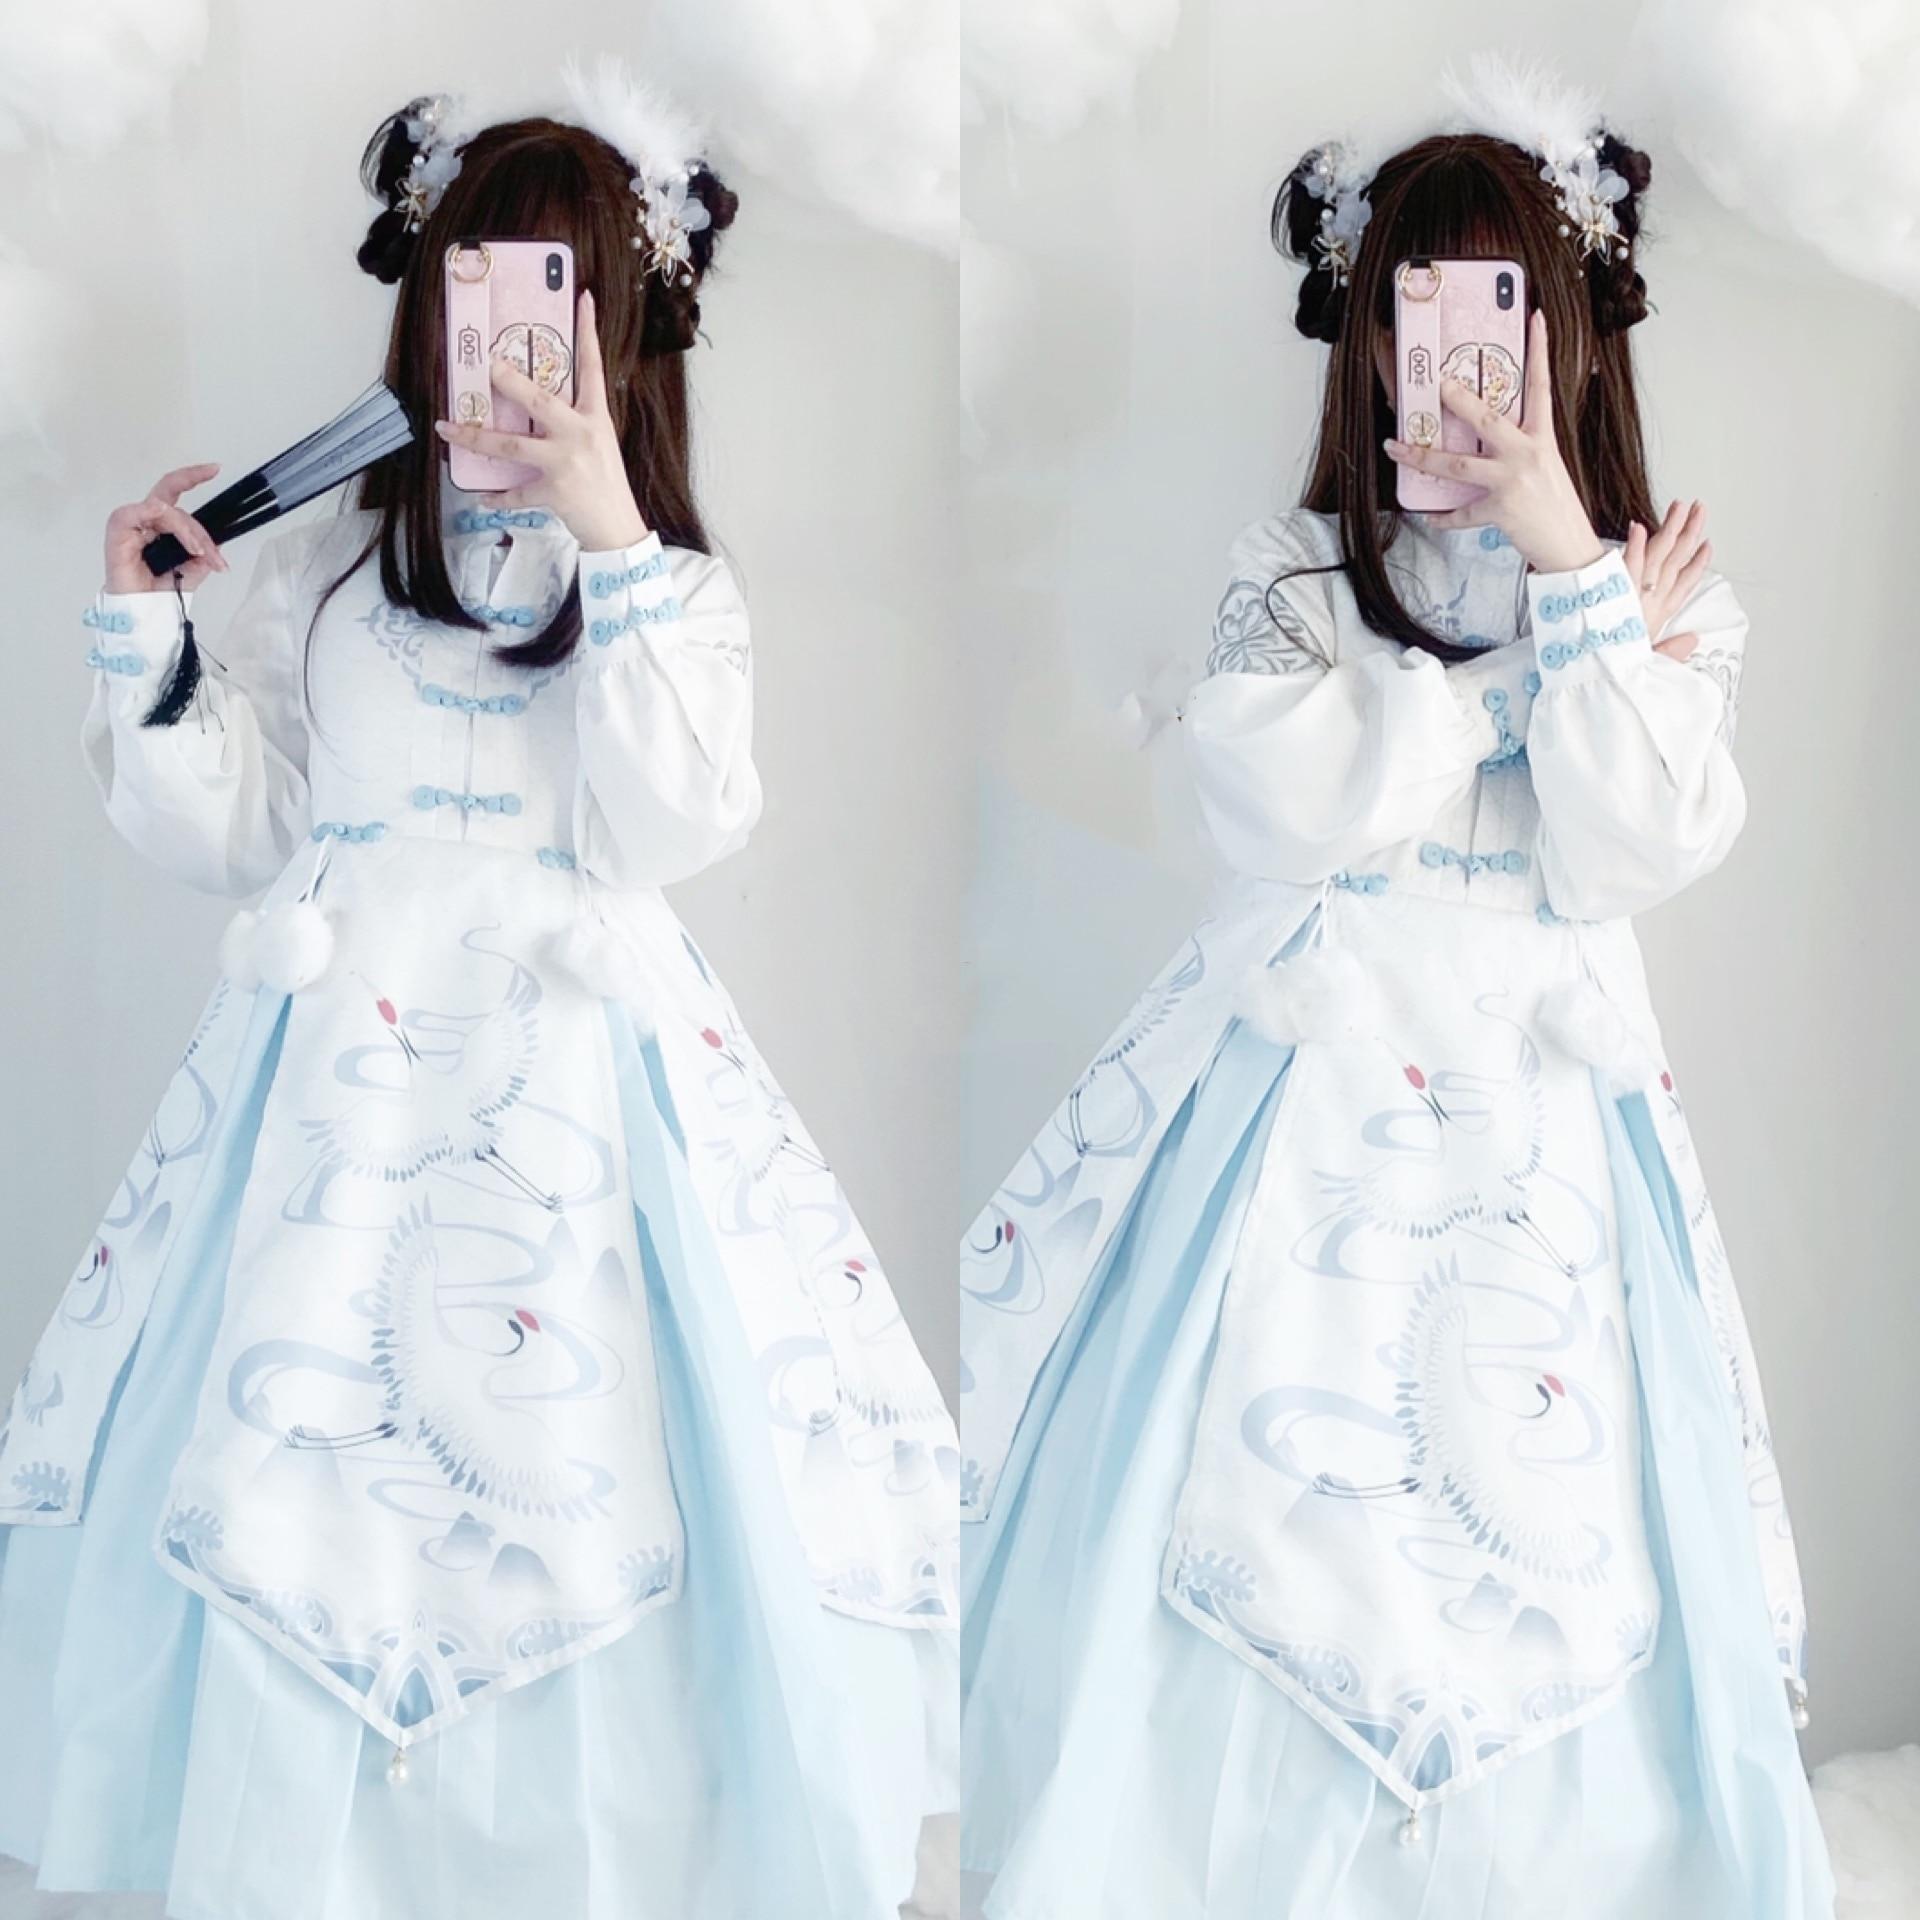 Winter Women Chinese Style Han Element Crane Sleeveless Jsk Dress+ Young Girl Sweet Blouse Two Piece Sets Princess Dress Cosplay